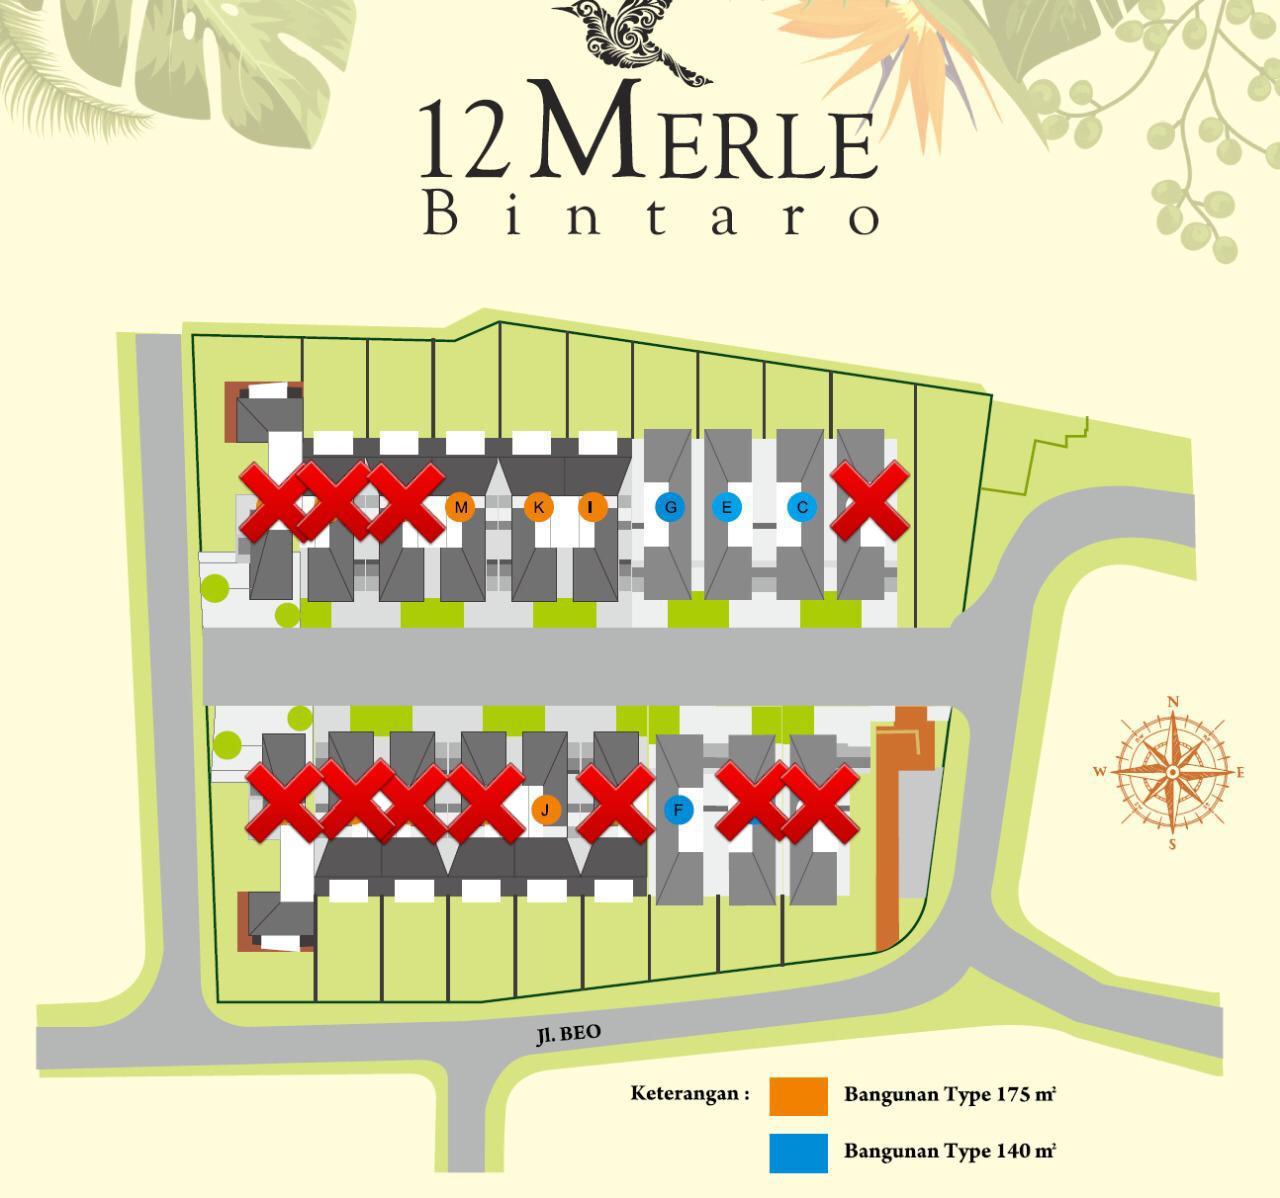 12-merle-bintaro